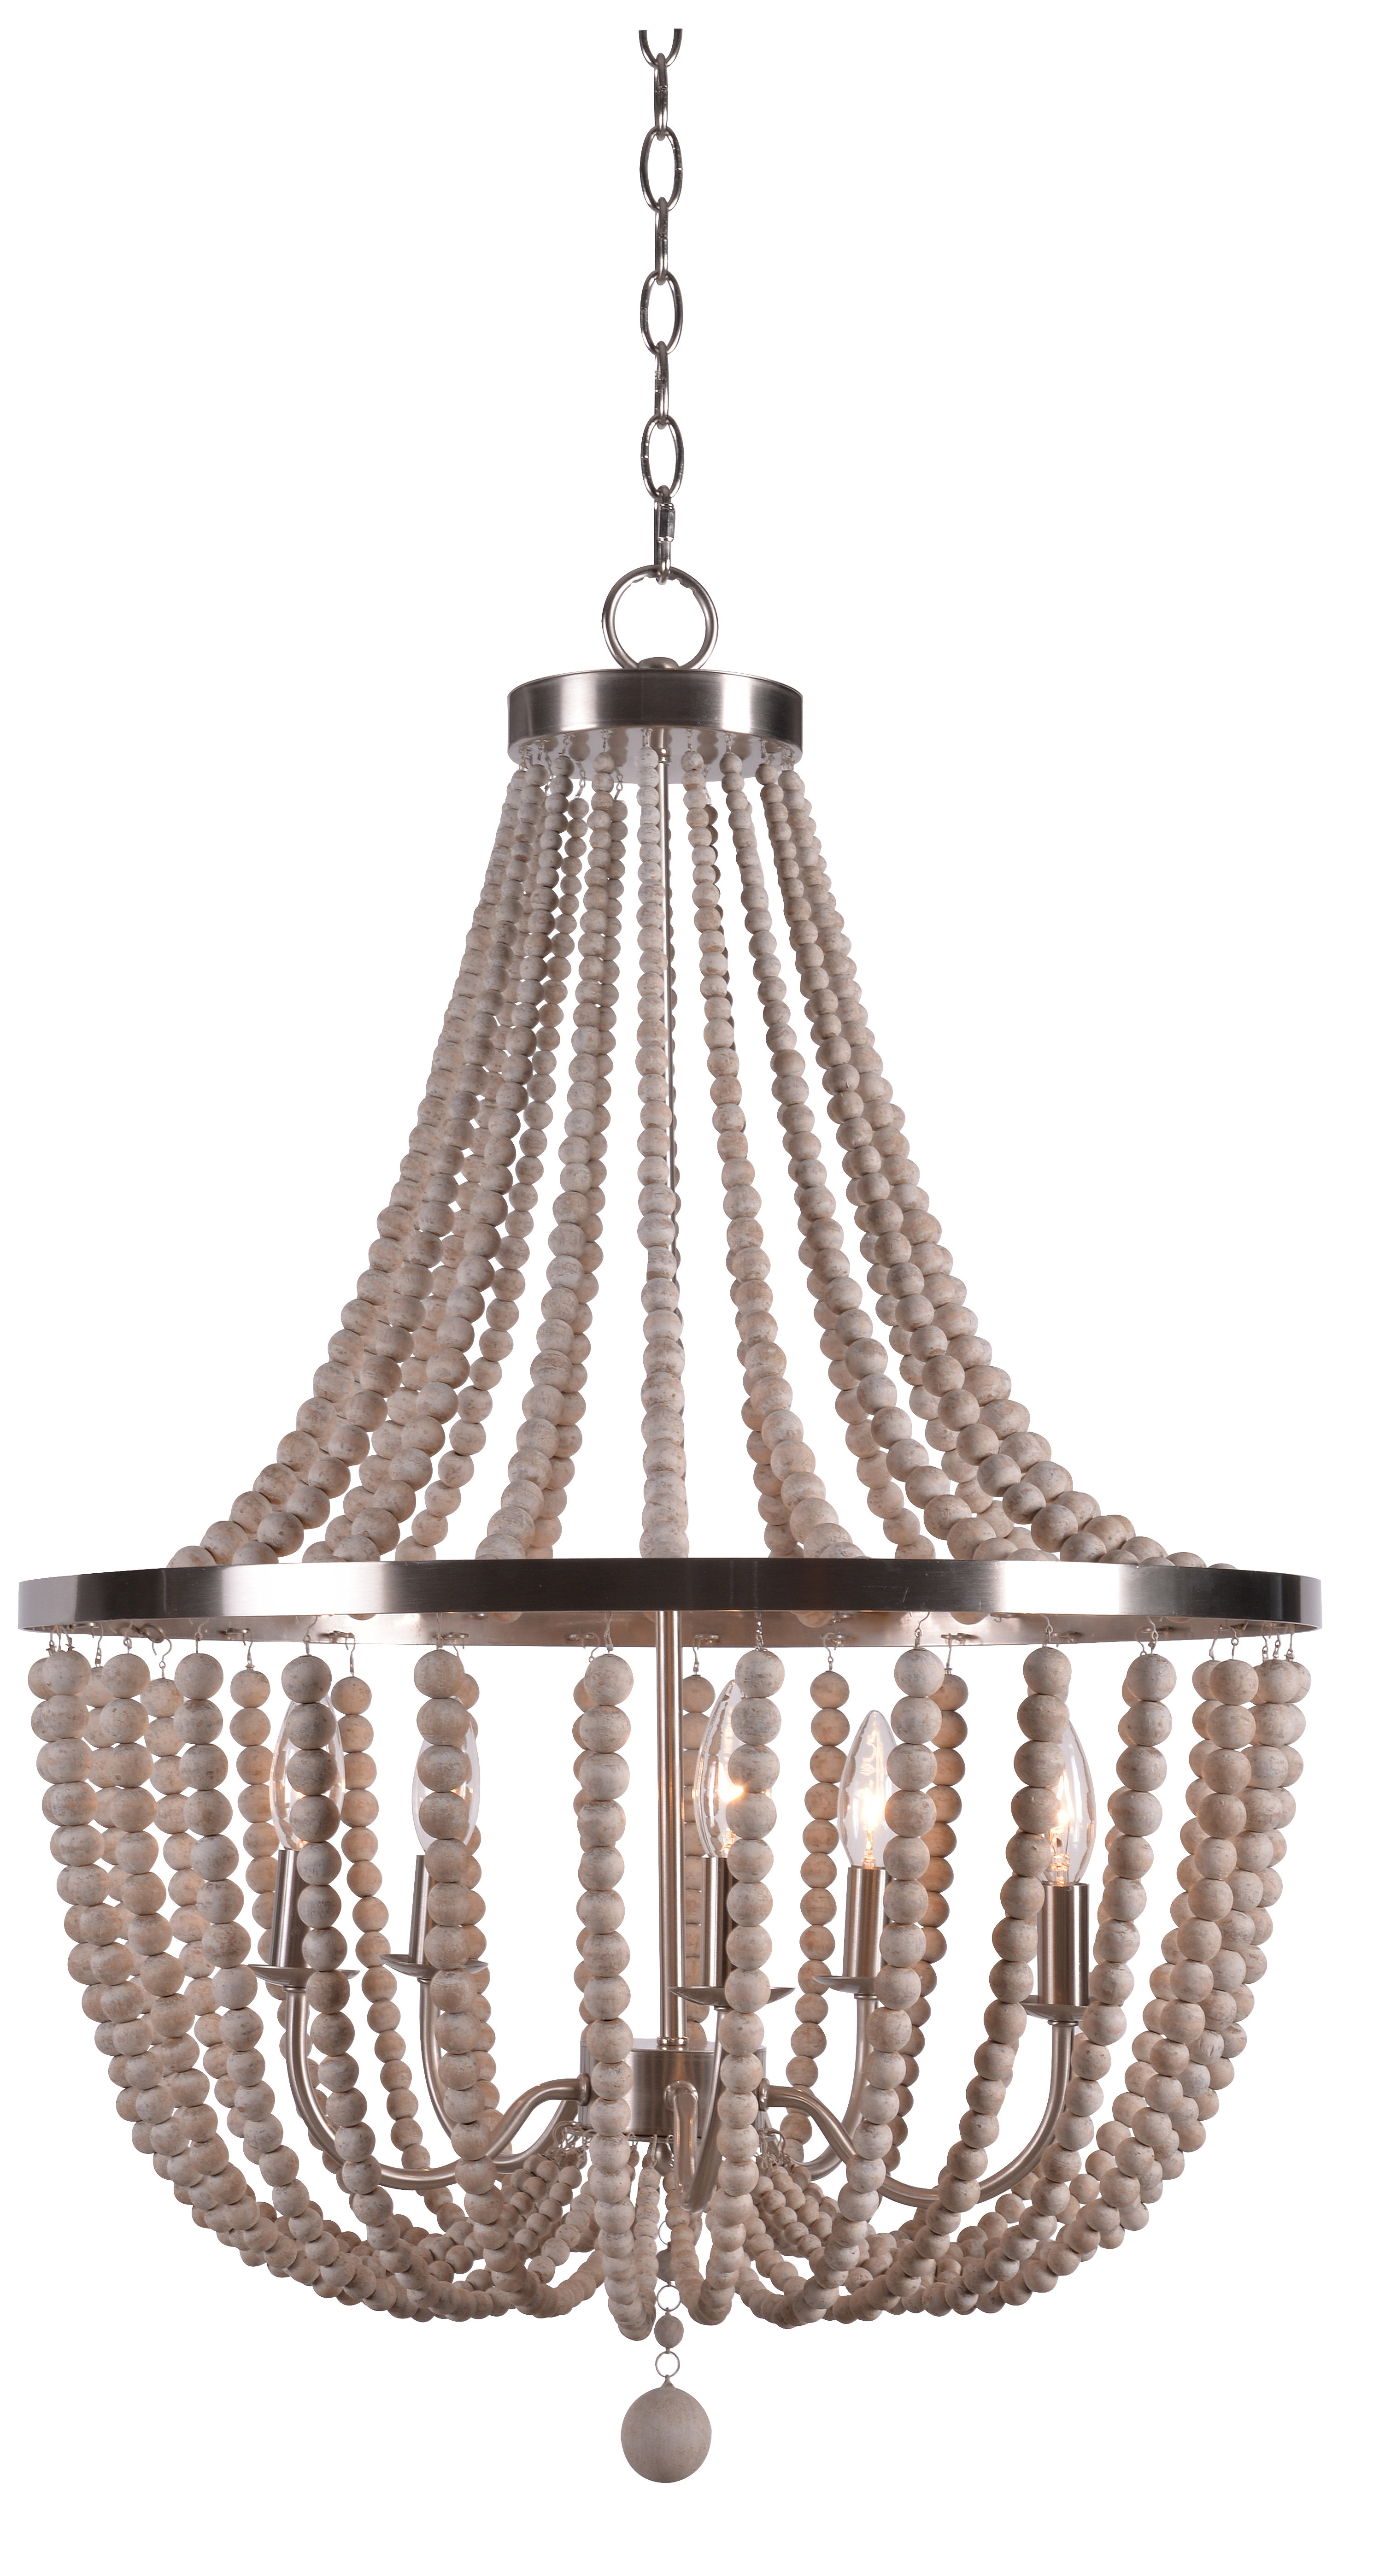 Most Popular Tilden Wood Bead 5 Light Empire Chandelier With Duron 5 Light Empire Chandeliers (View 4 of 20)